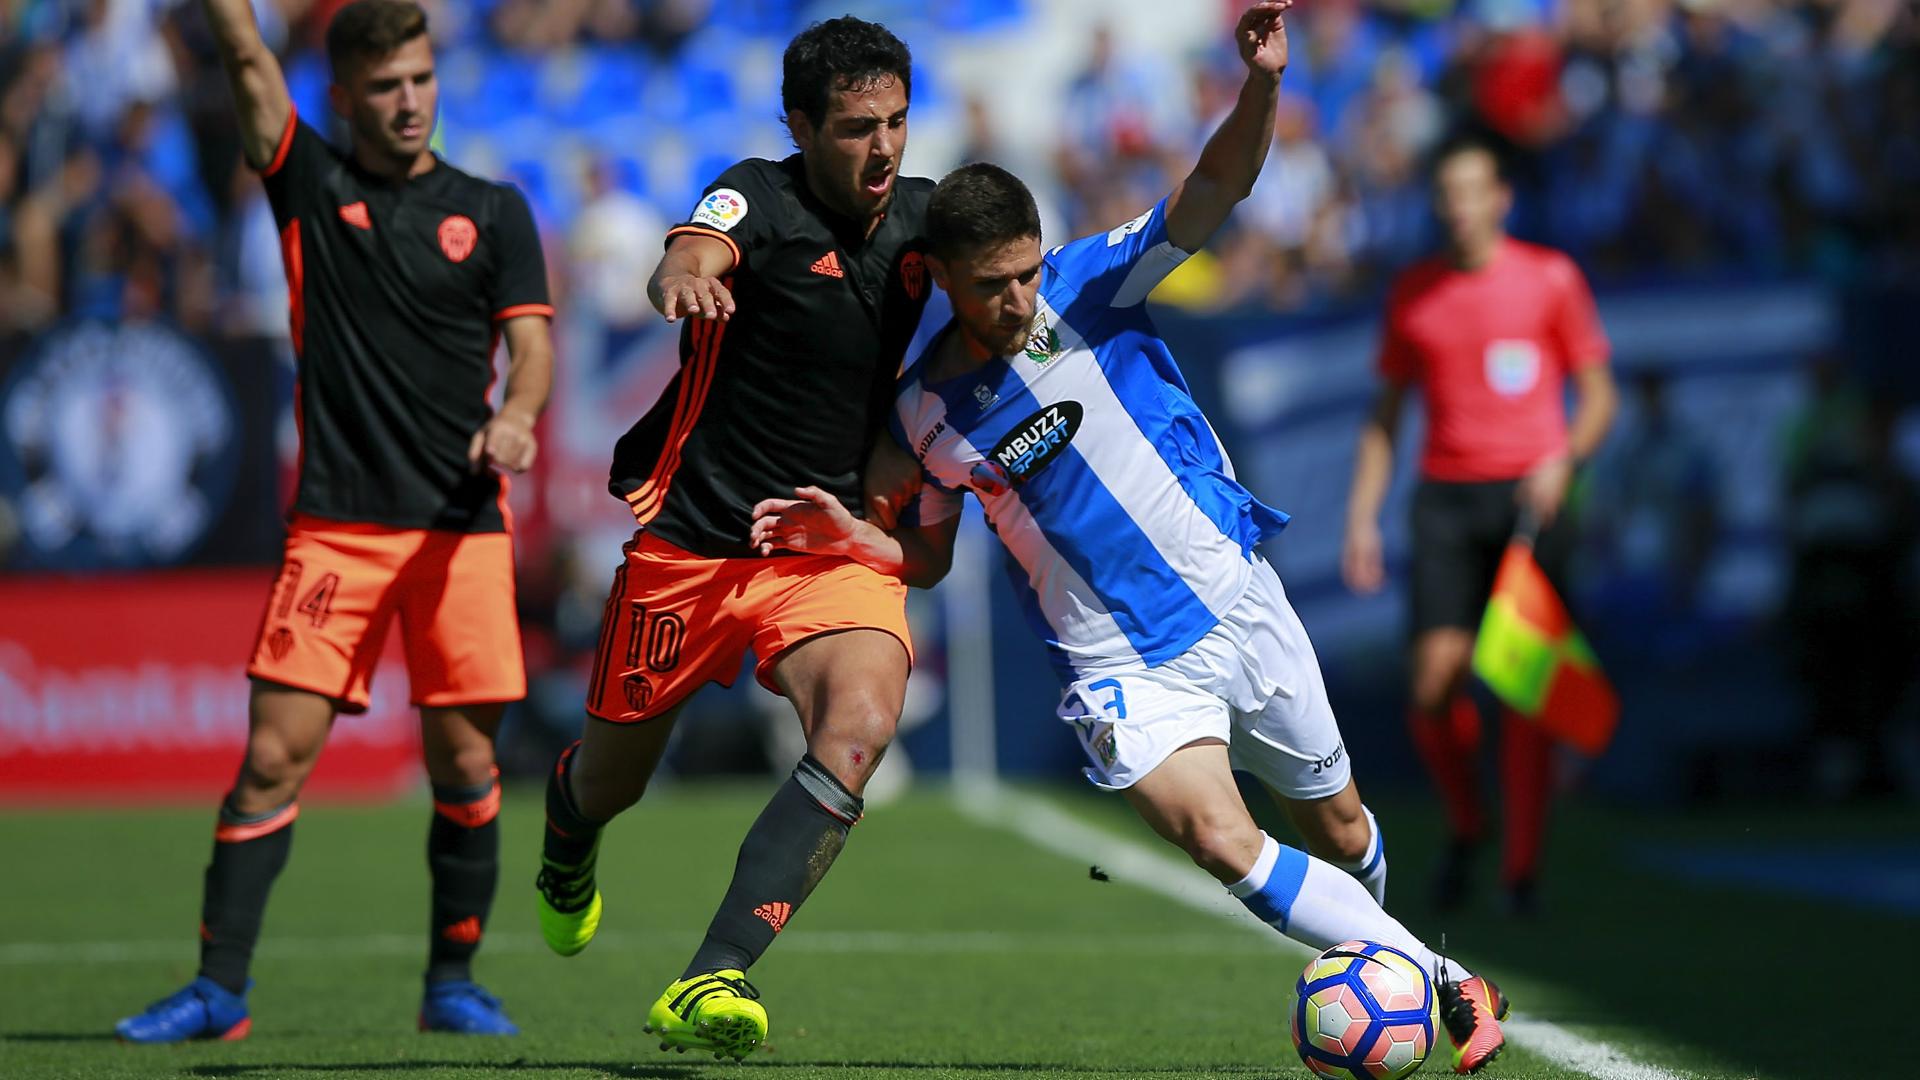 Прогноз на матч Атлетик Бильбао - Леганес 20 августа 2018